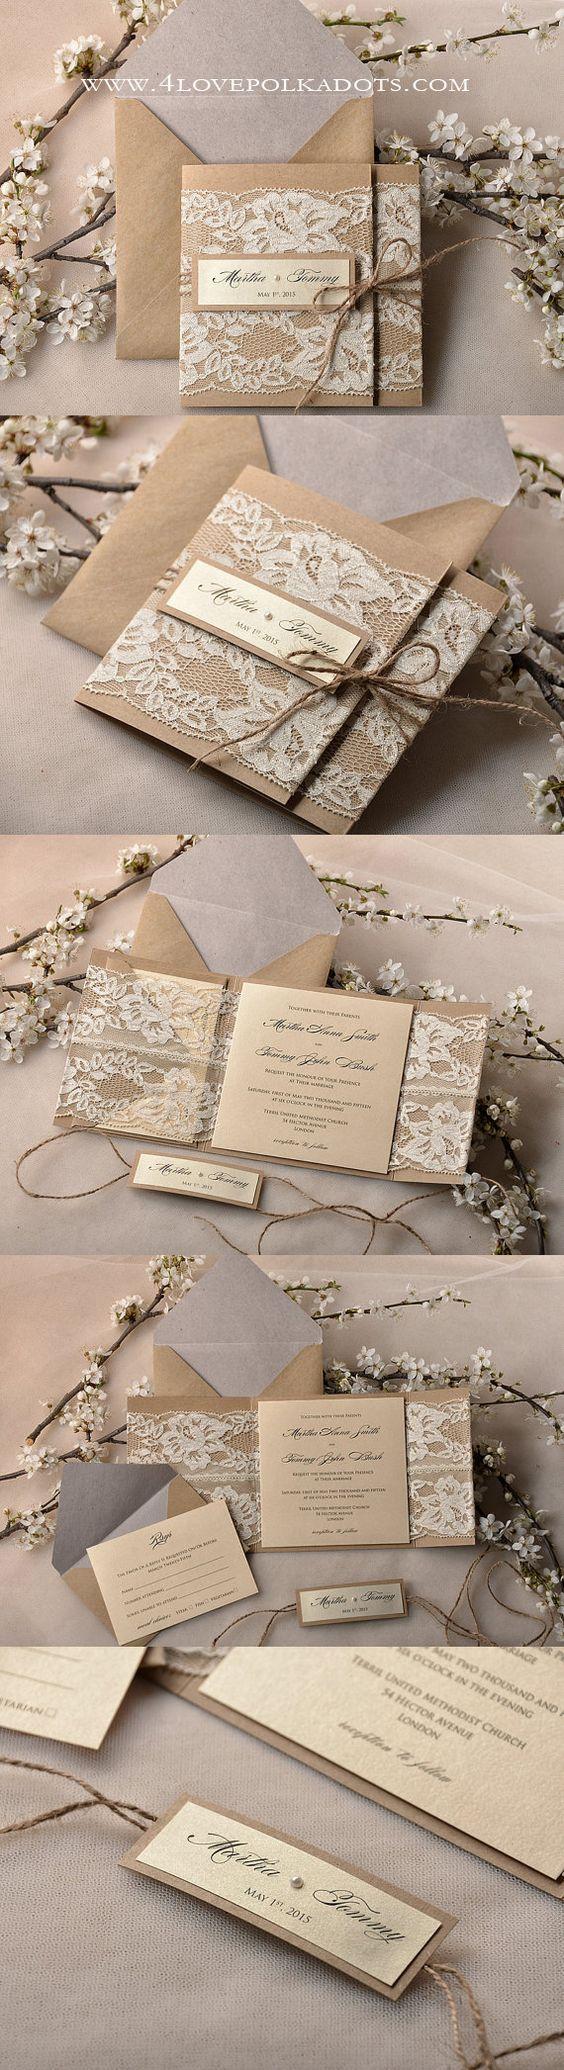 Rustic Lace Wedding Invitations  ||  @4LOVEPolkaDots